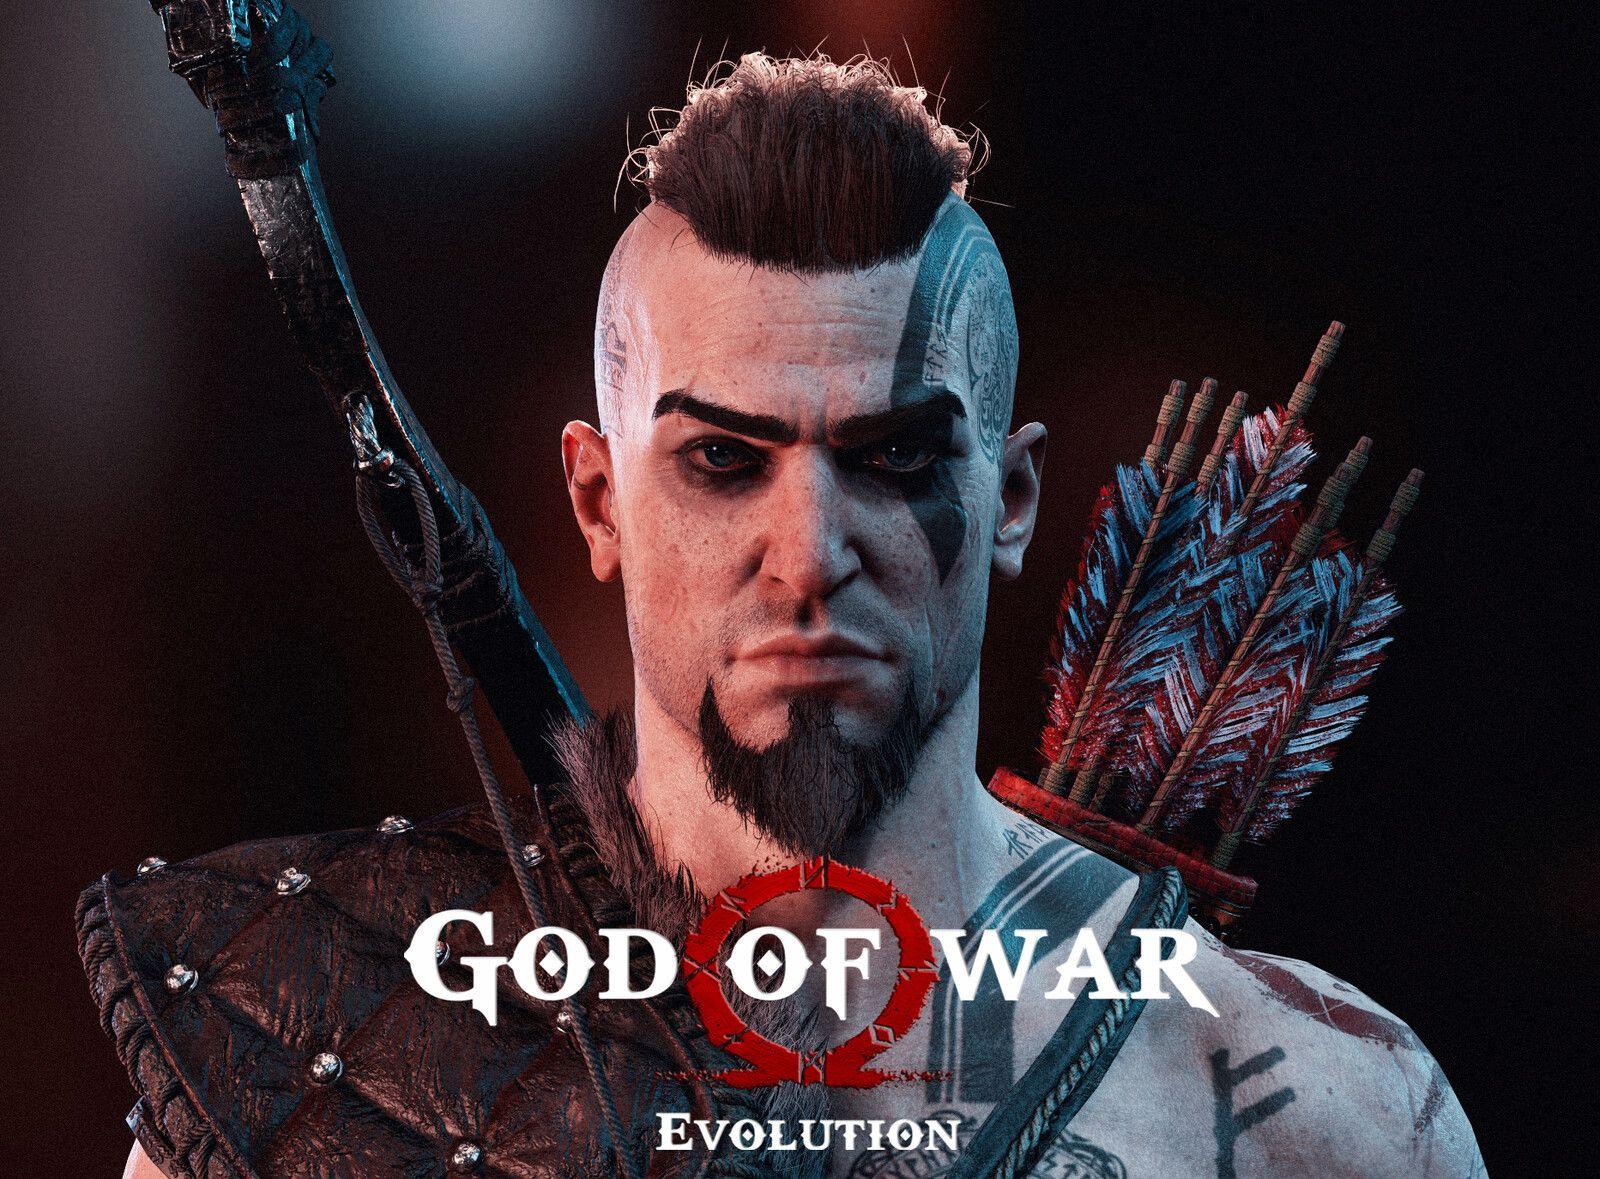 God Of War Evolution Atreus Fanart Andre Sik On Artstation At Https Www Artstation Com Artwork 0x1ezv God Of War Atreus Fanart Atreus God Of War